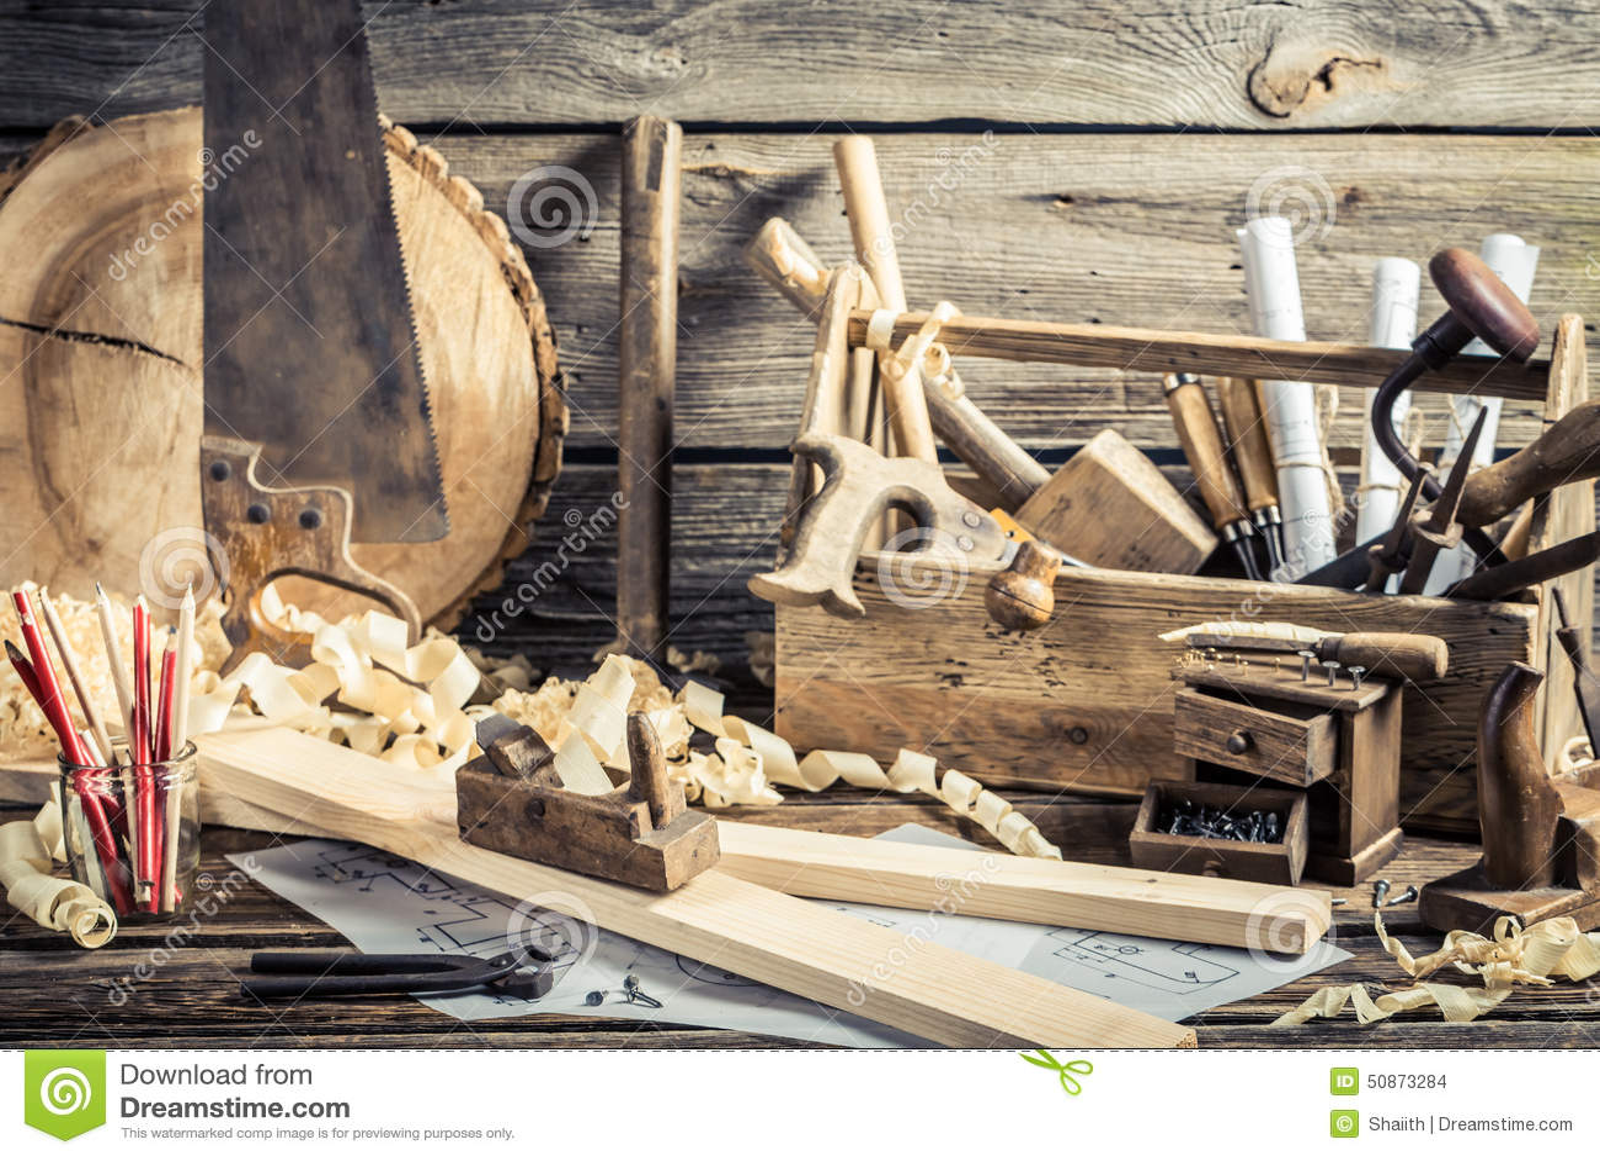 Antique Carpentry Workshop Stock Photo Image Of Carpentry